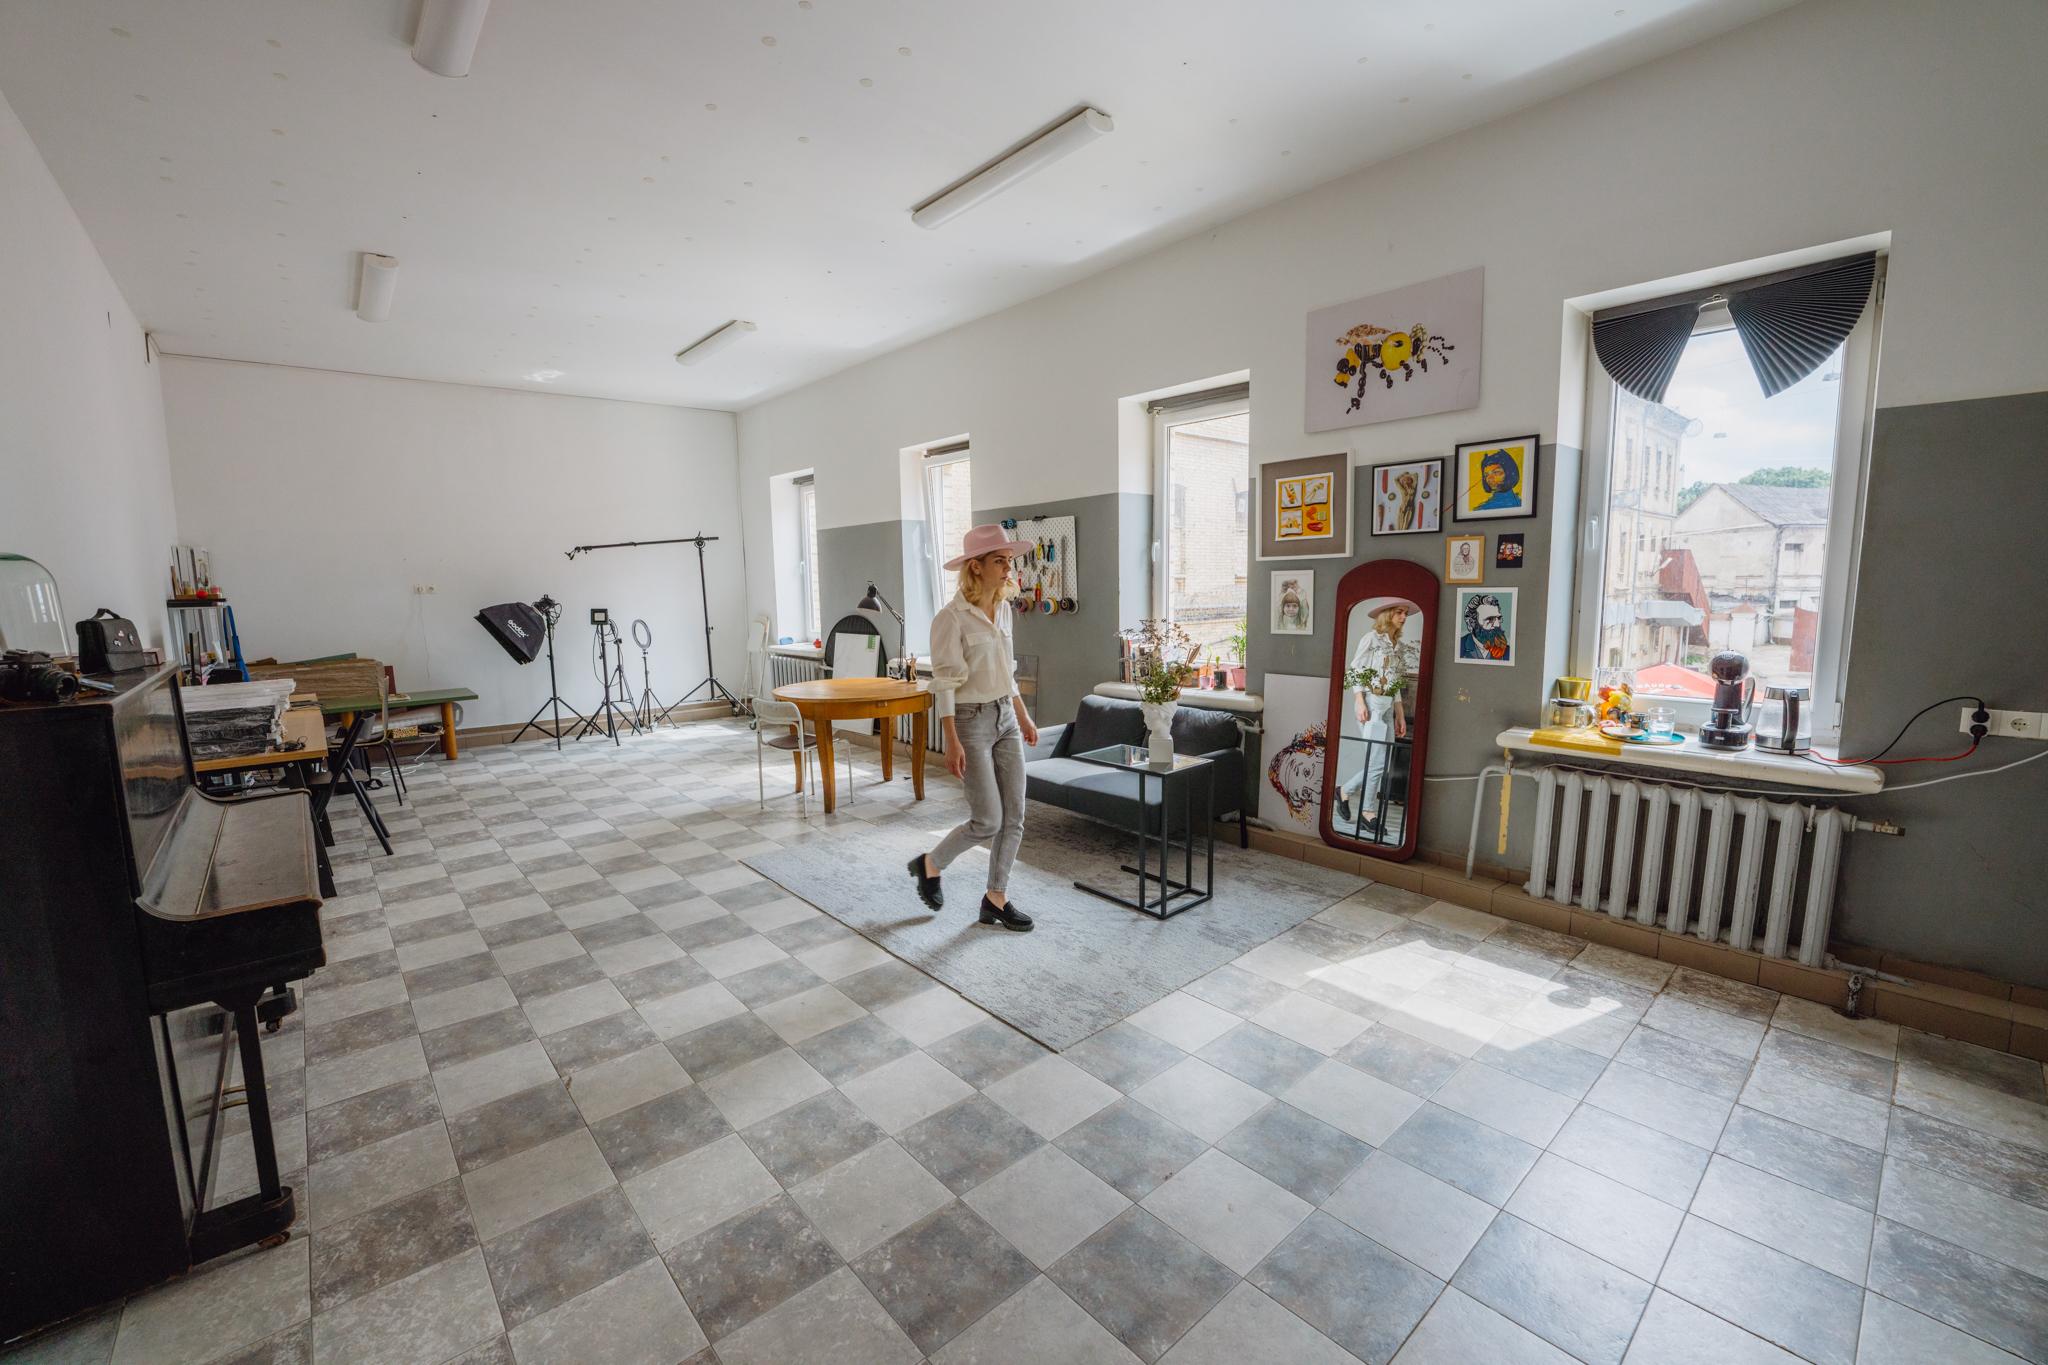 Jolita Vaitkutė in her studio at the former Lukiškės prison